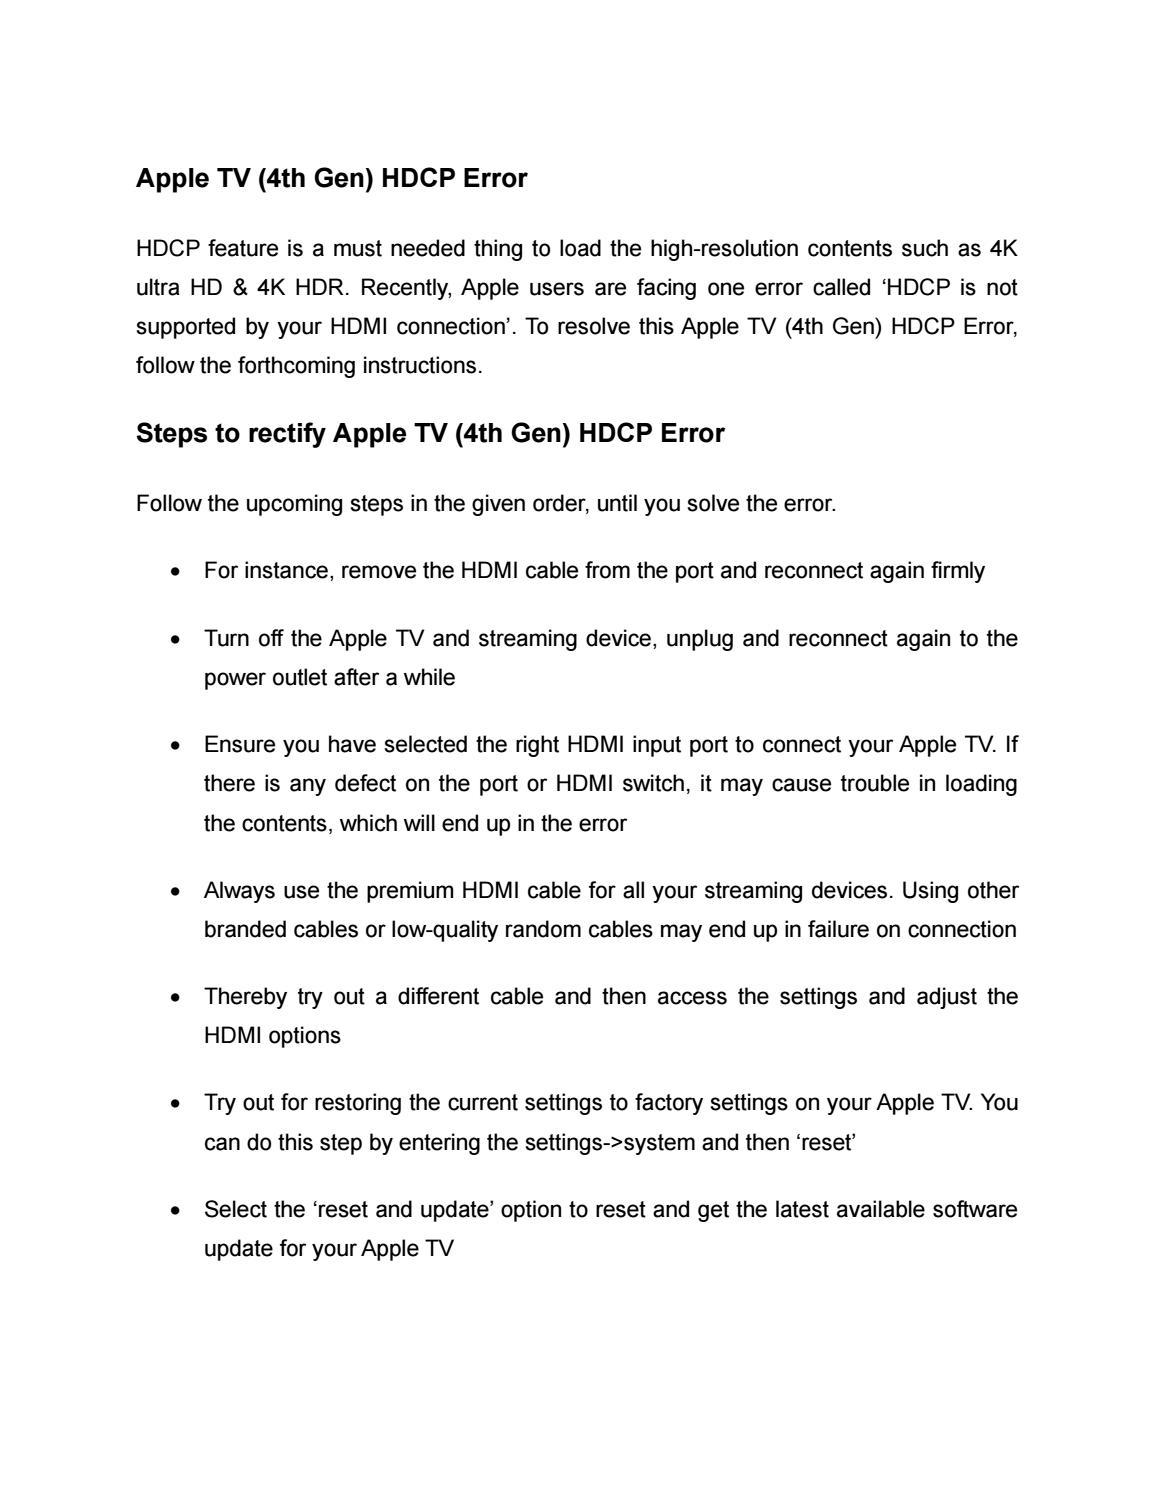 Apple TV (4th Gen) HDCP Error by georgethepeter@rokuhdcp - issuu